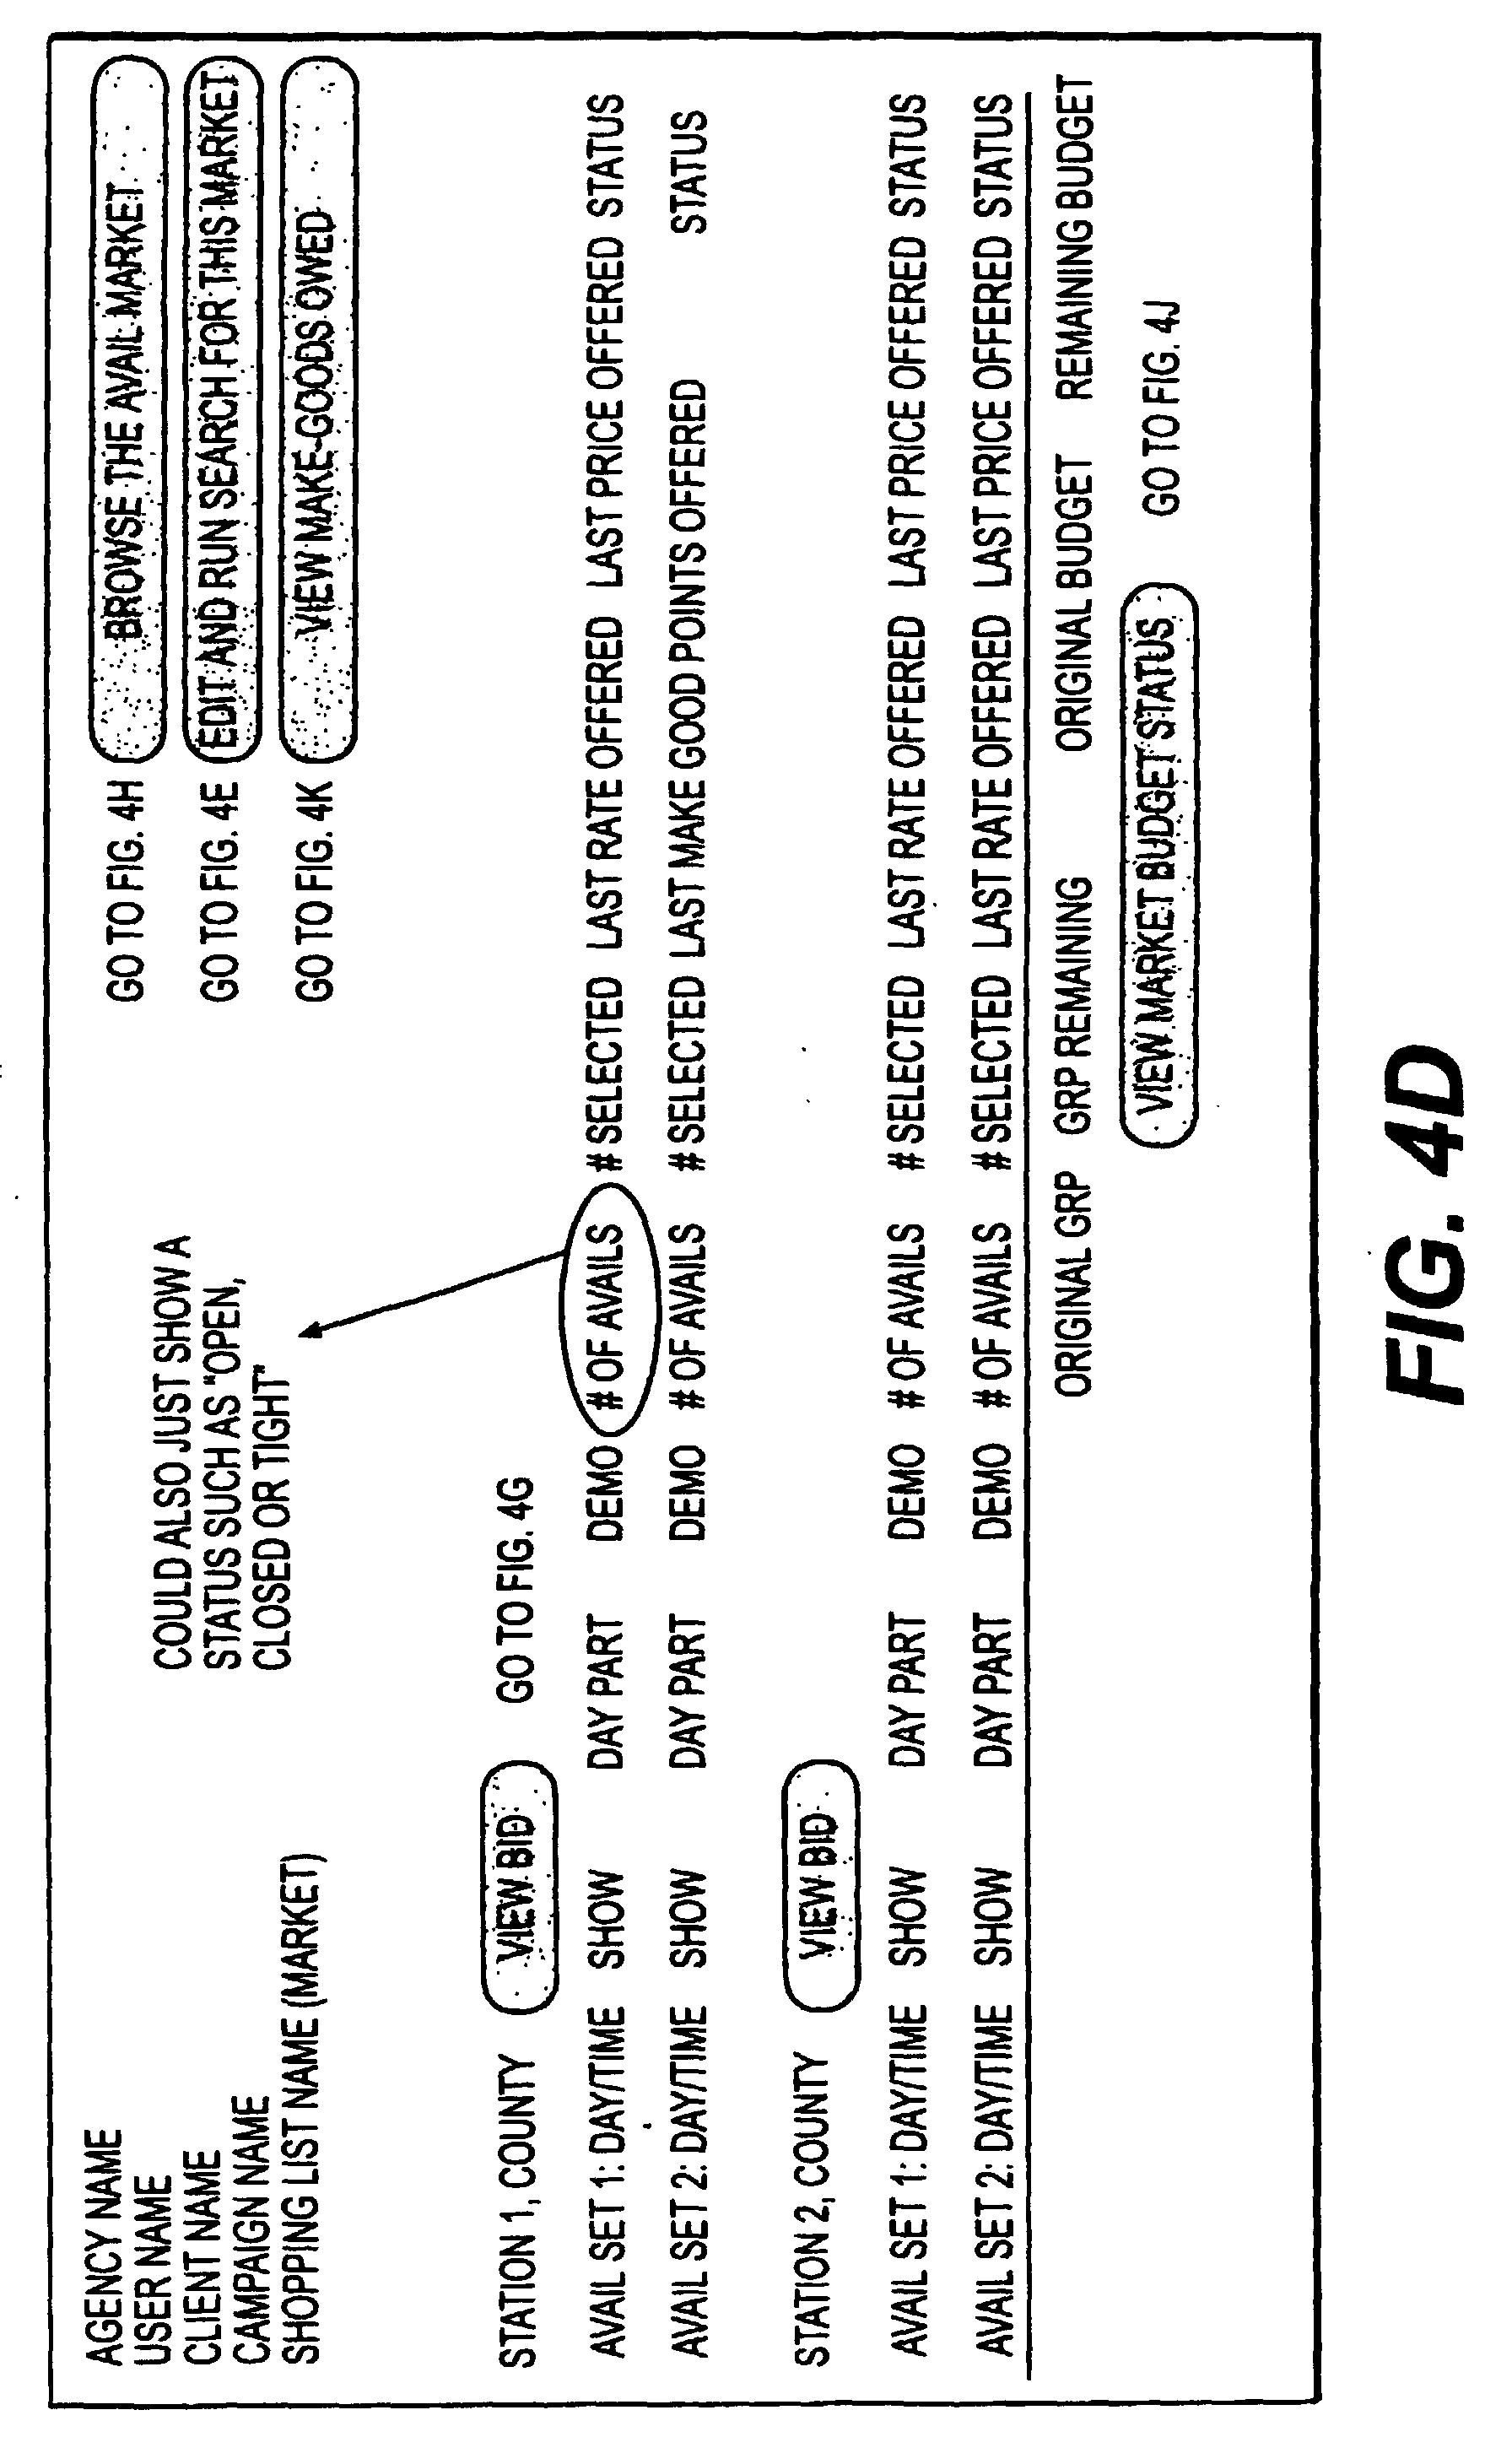 patent ep1026610a2